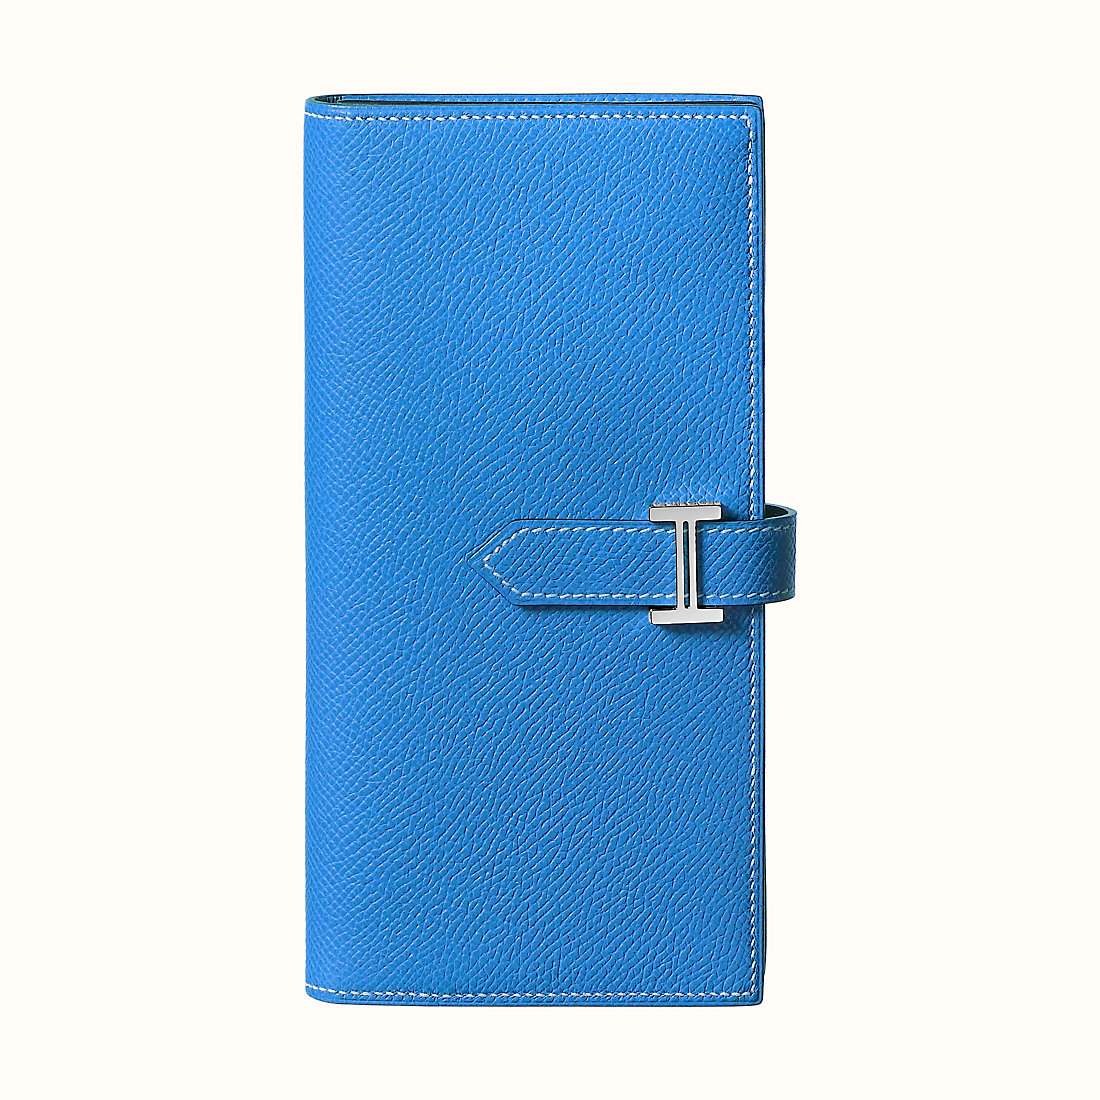 Hermes Bearn wallet Epsom CKB3 Bleu Zanzibar 坦桑尼亞藍